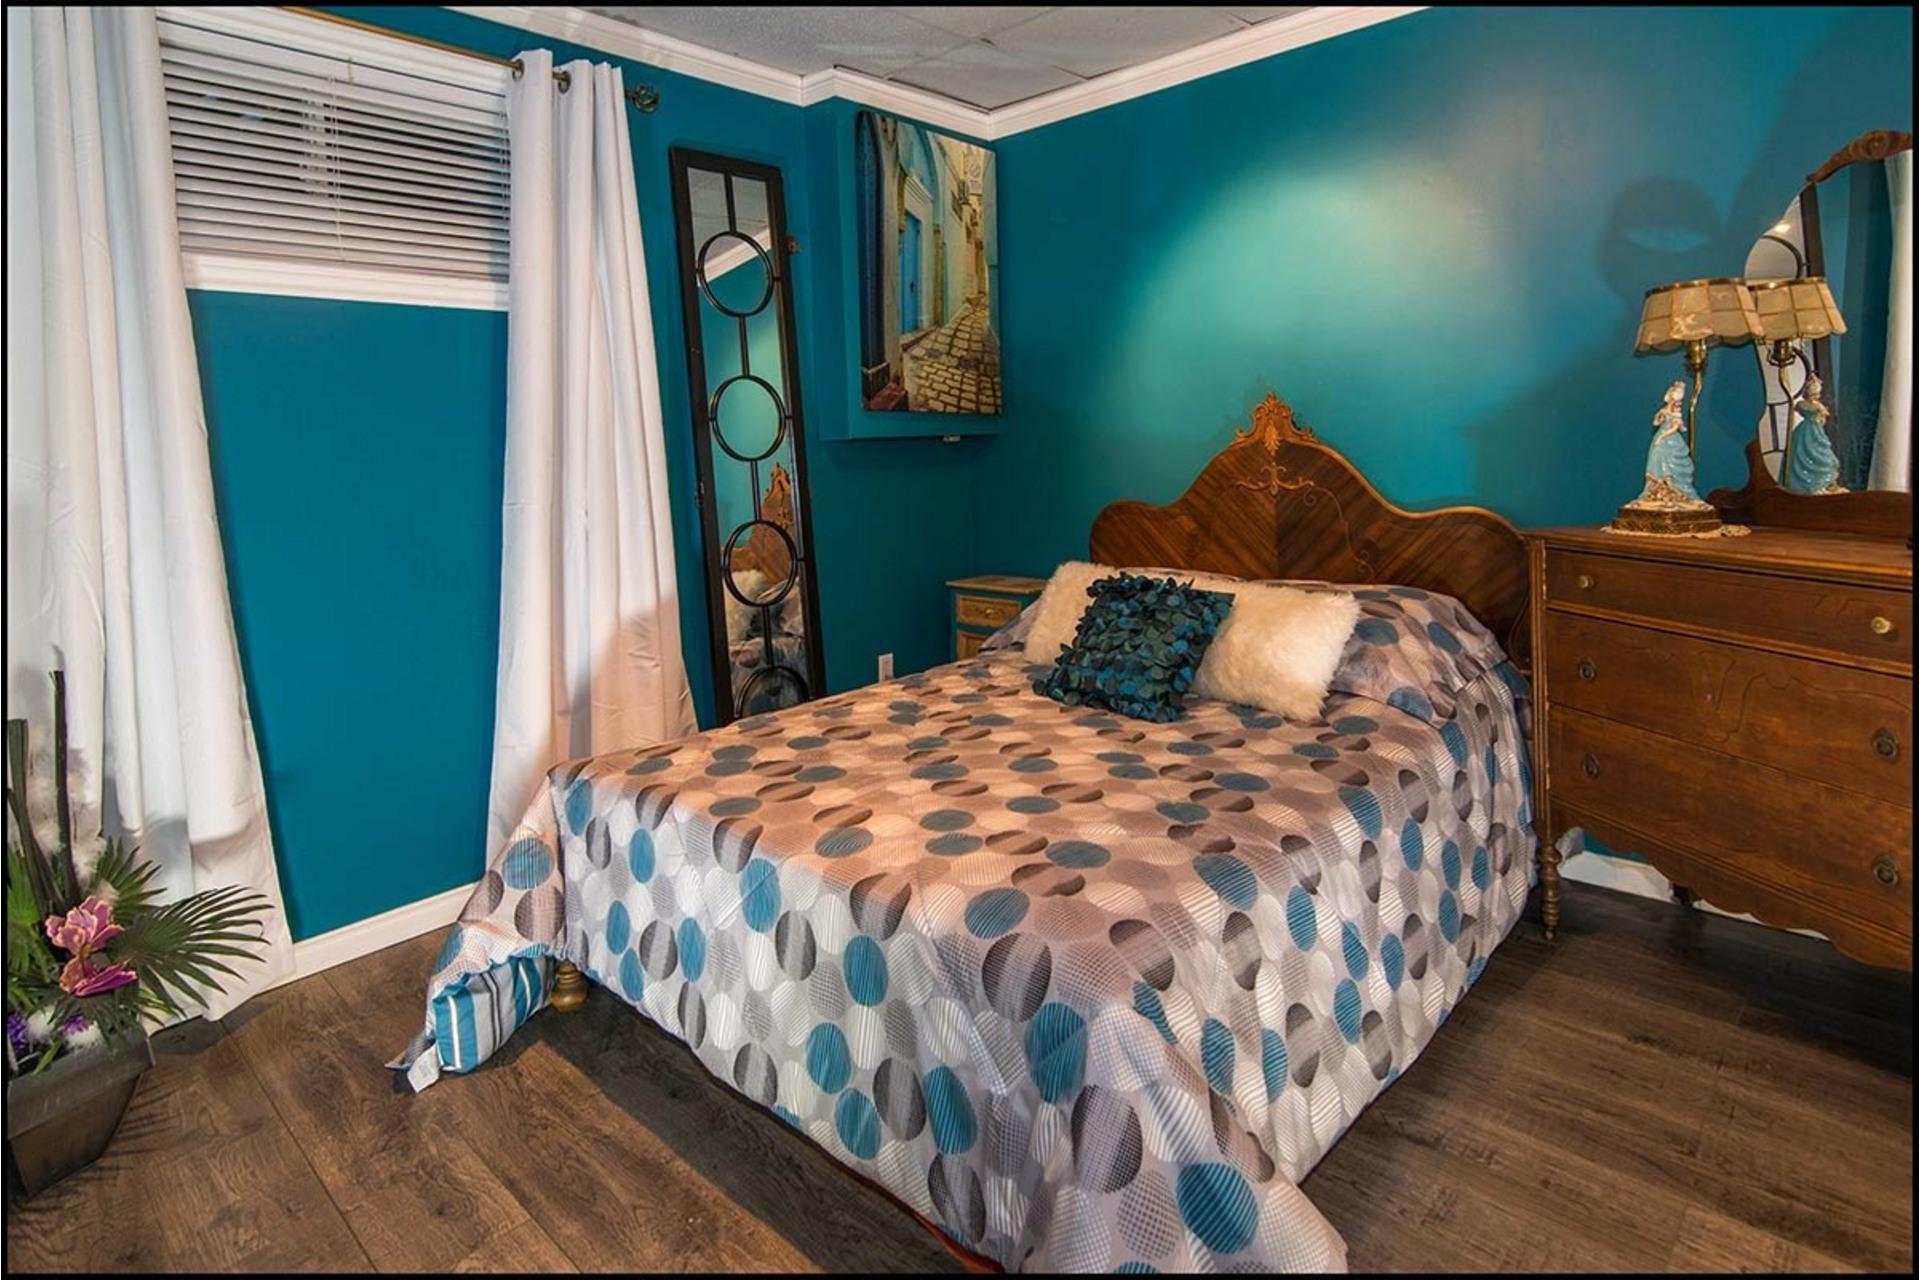 image 15 - House For sale Sainte-Foy/Sillery/Cap-Rouge Québec  - 13 rooms